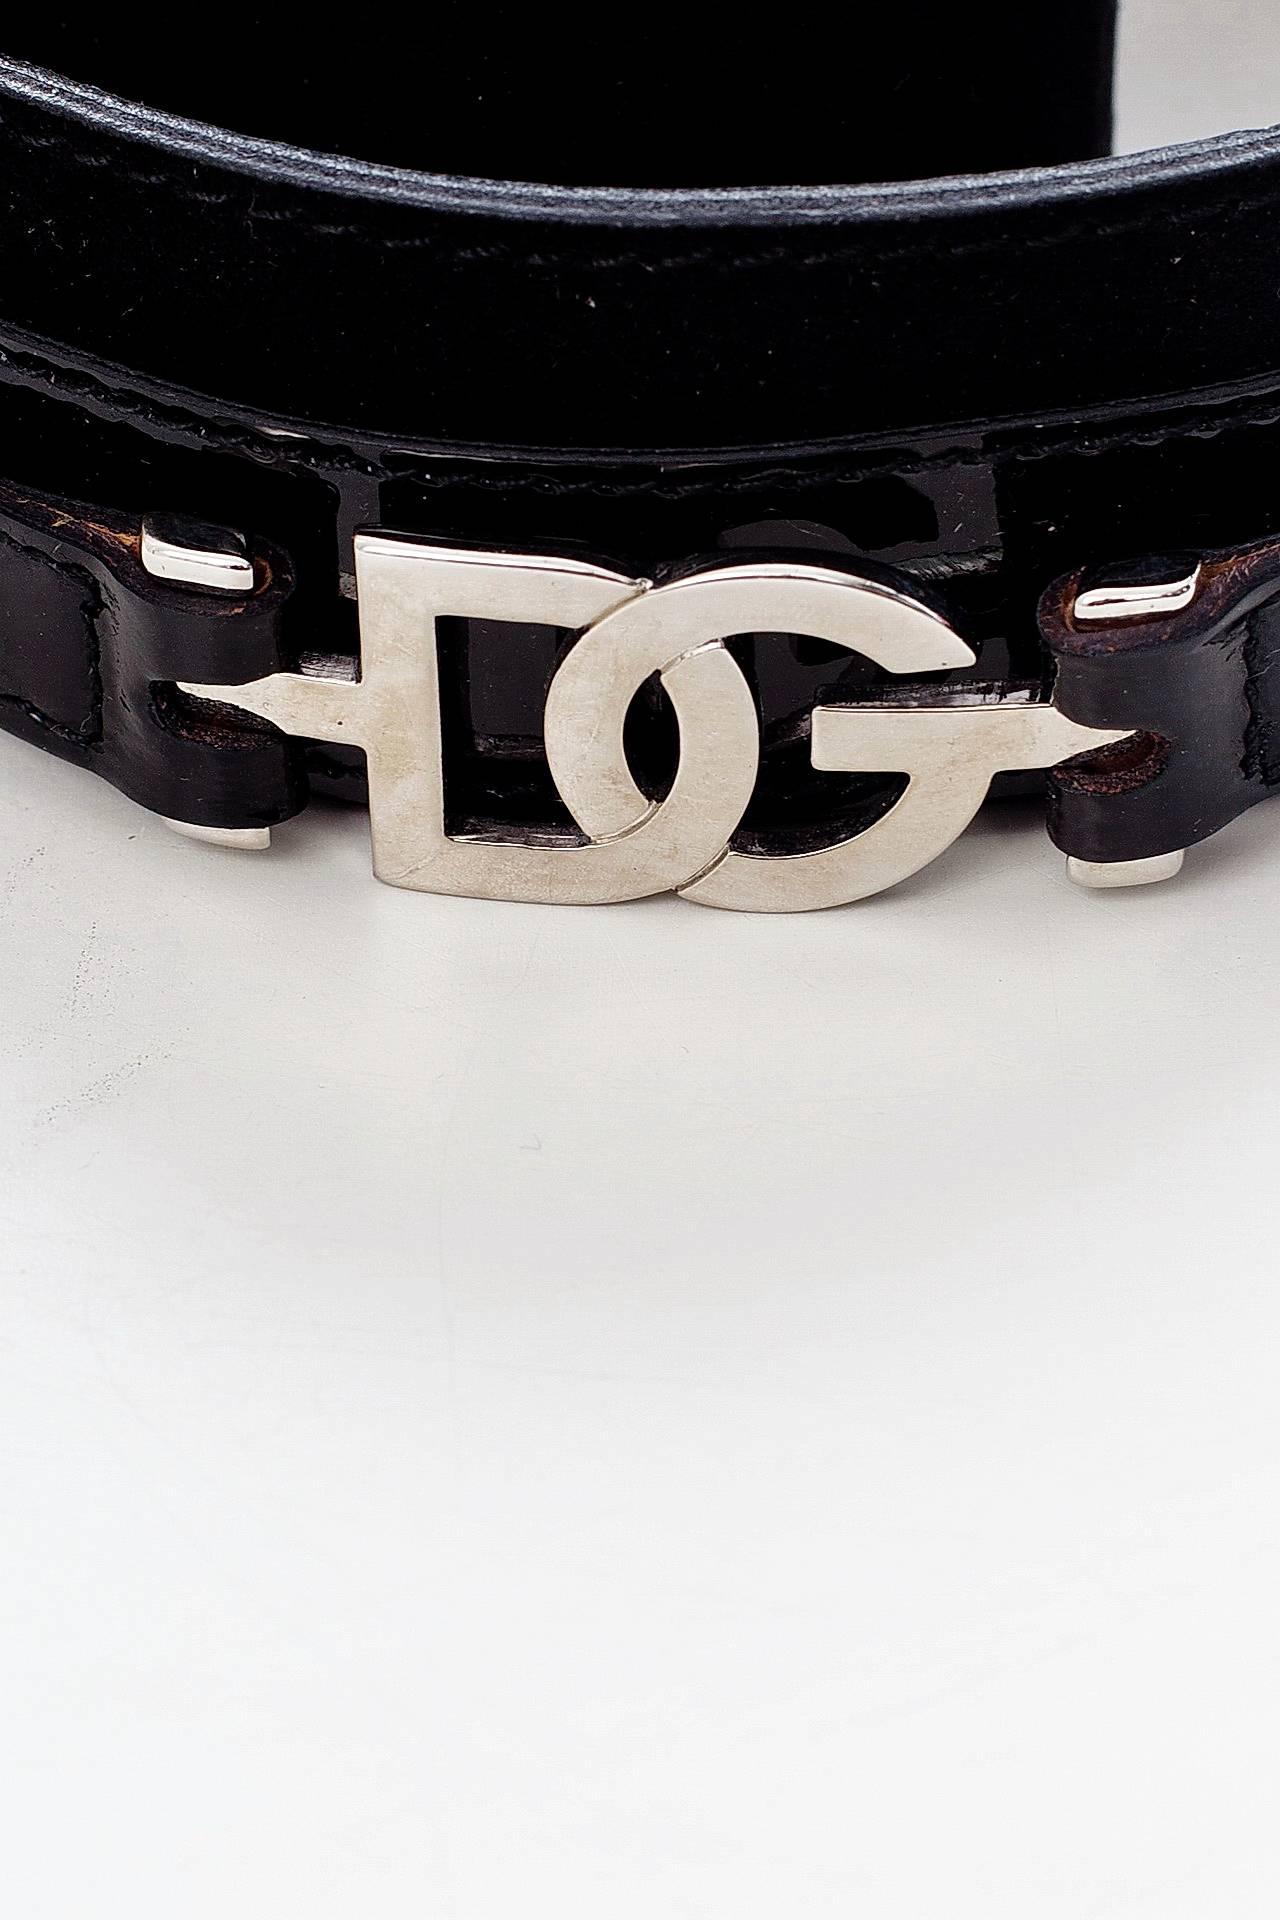 Chanel DG